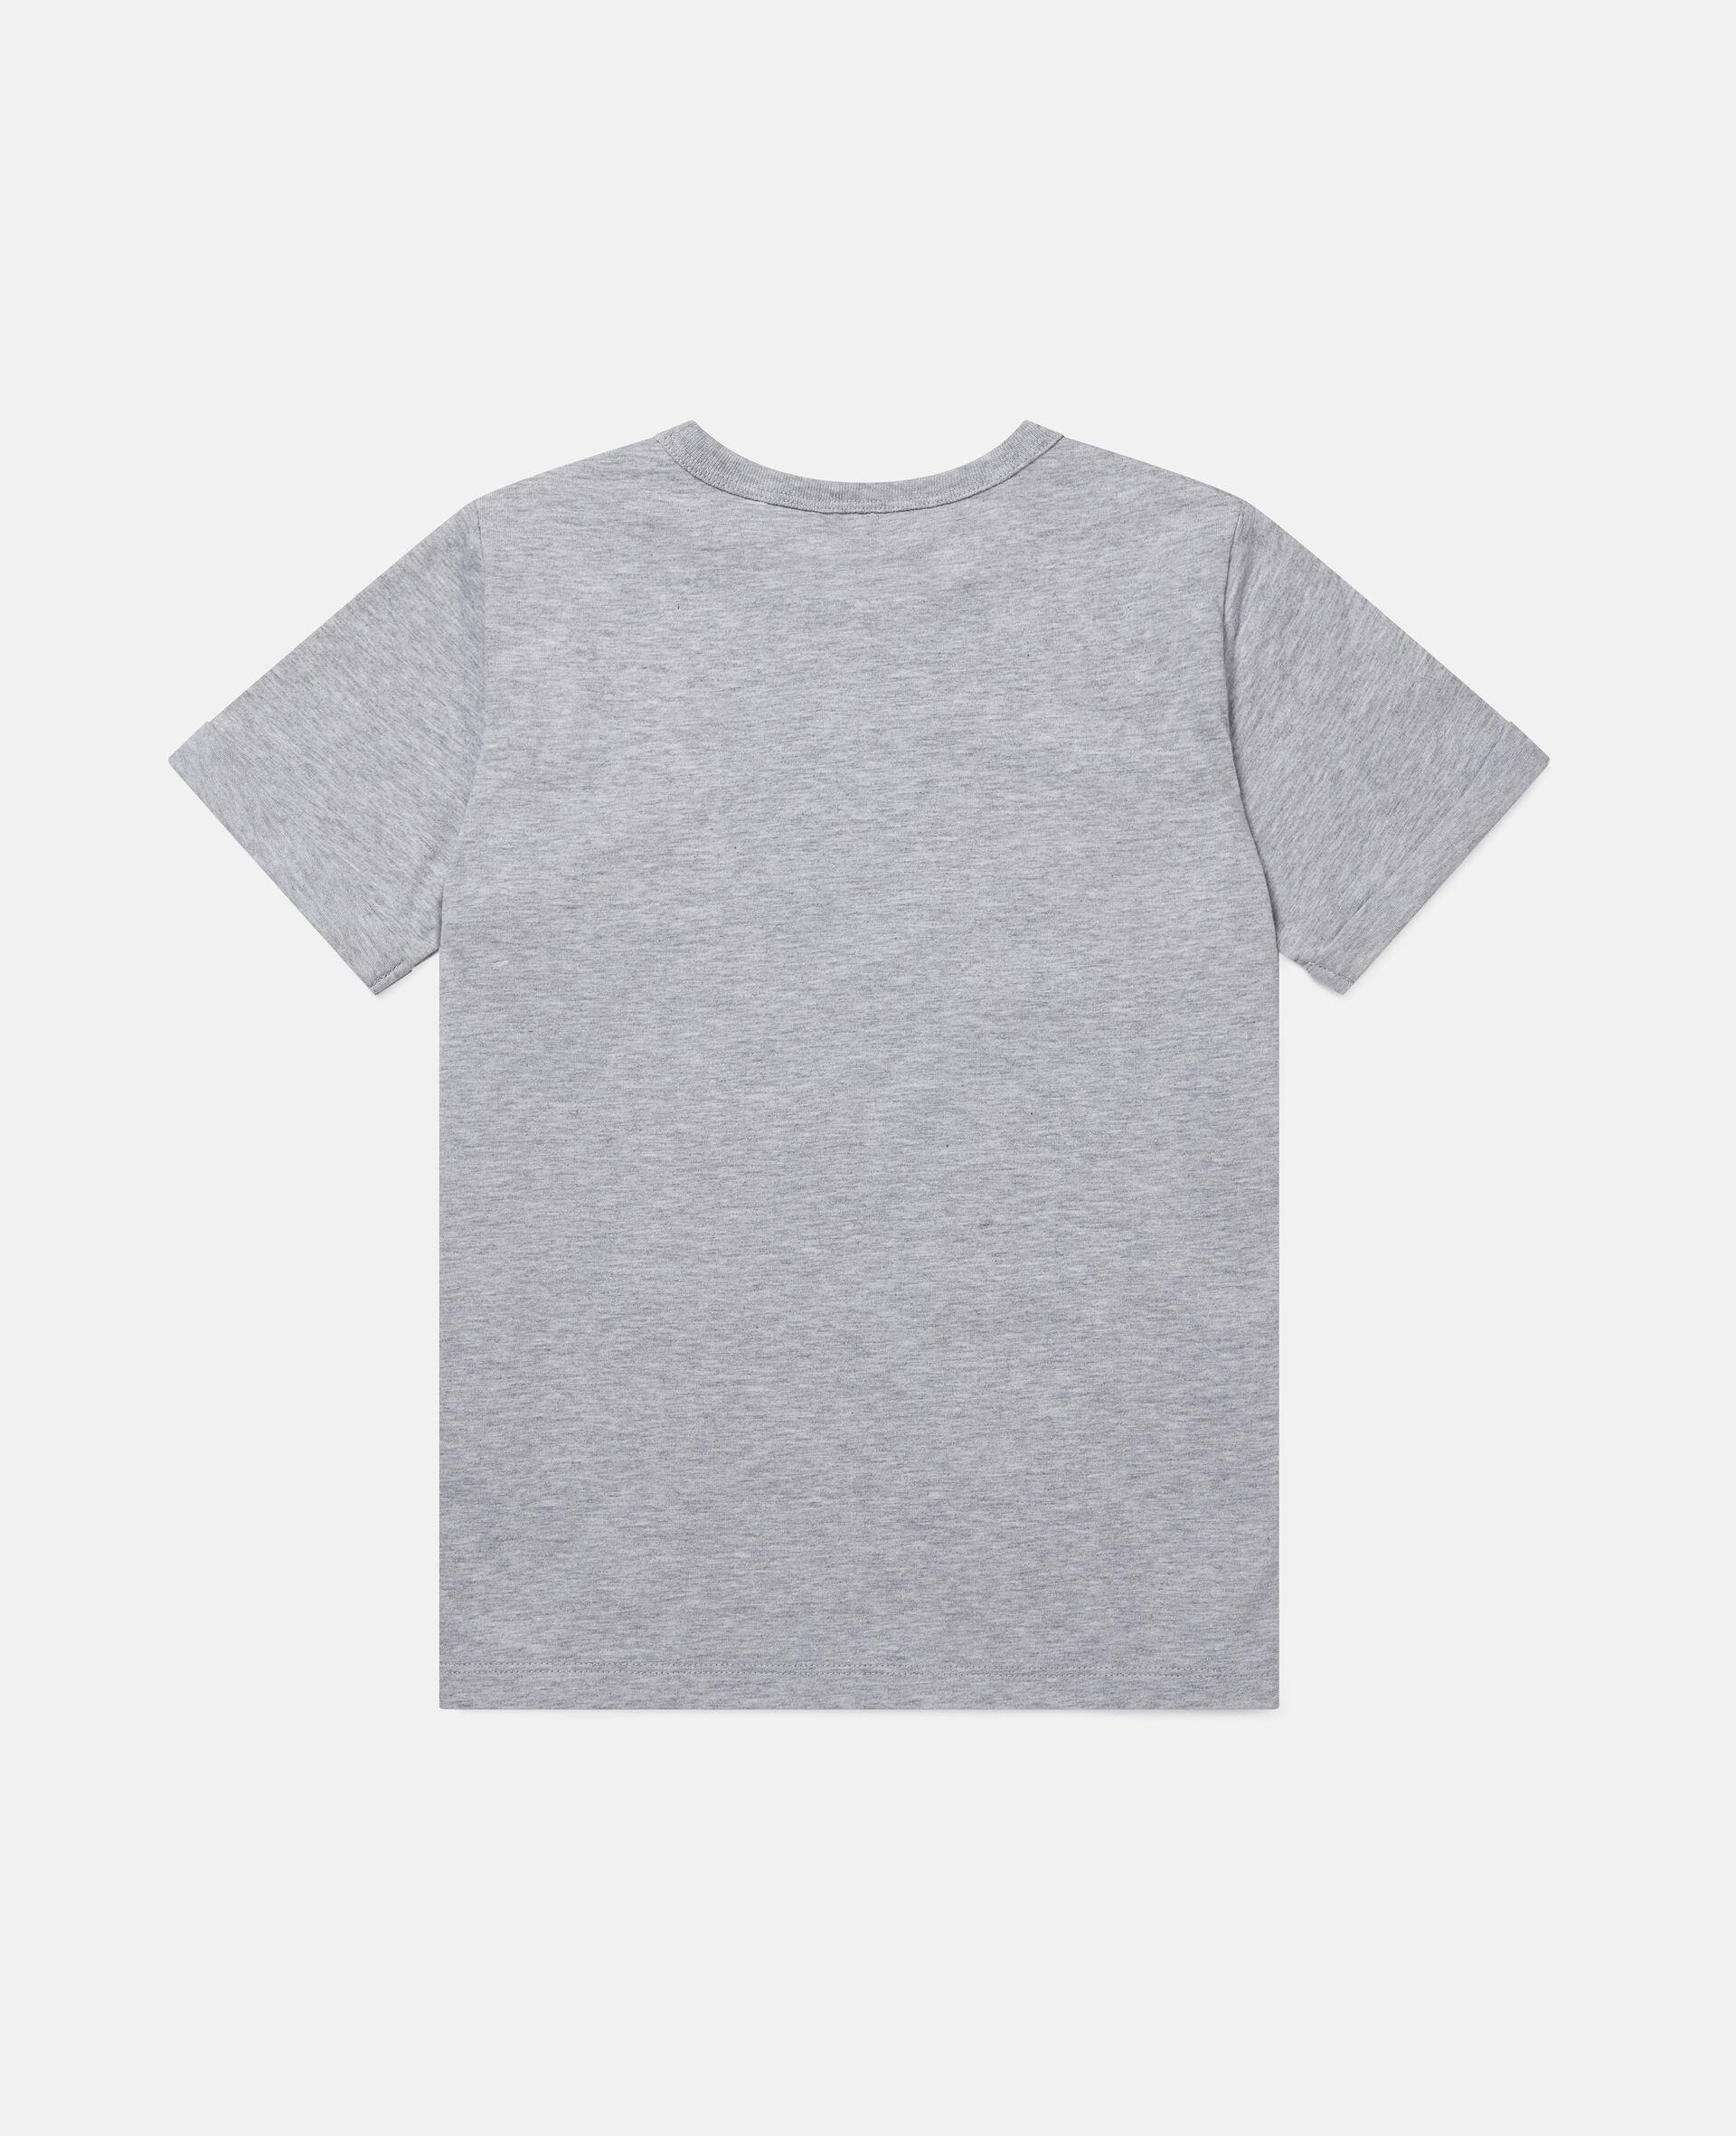 雏菊爱心印花棉质T恤-灰色-large image number 3